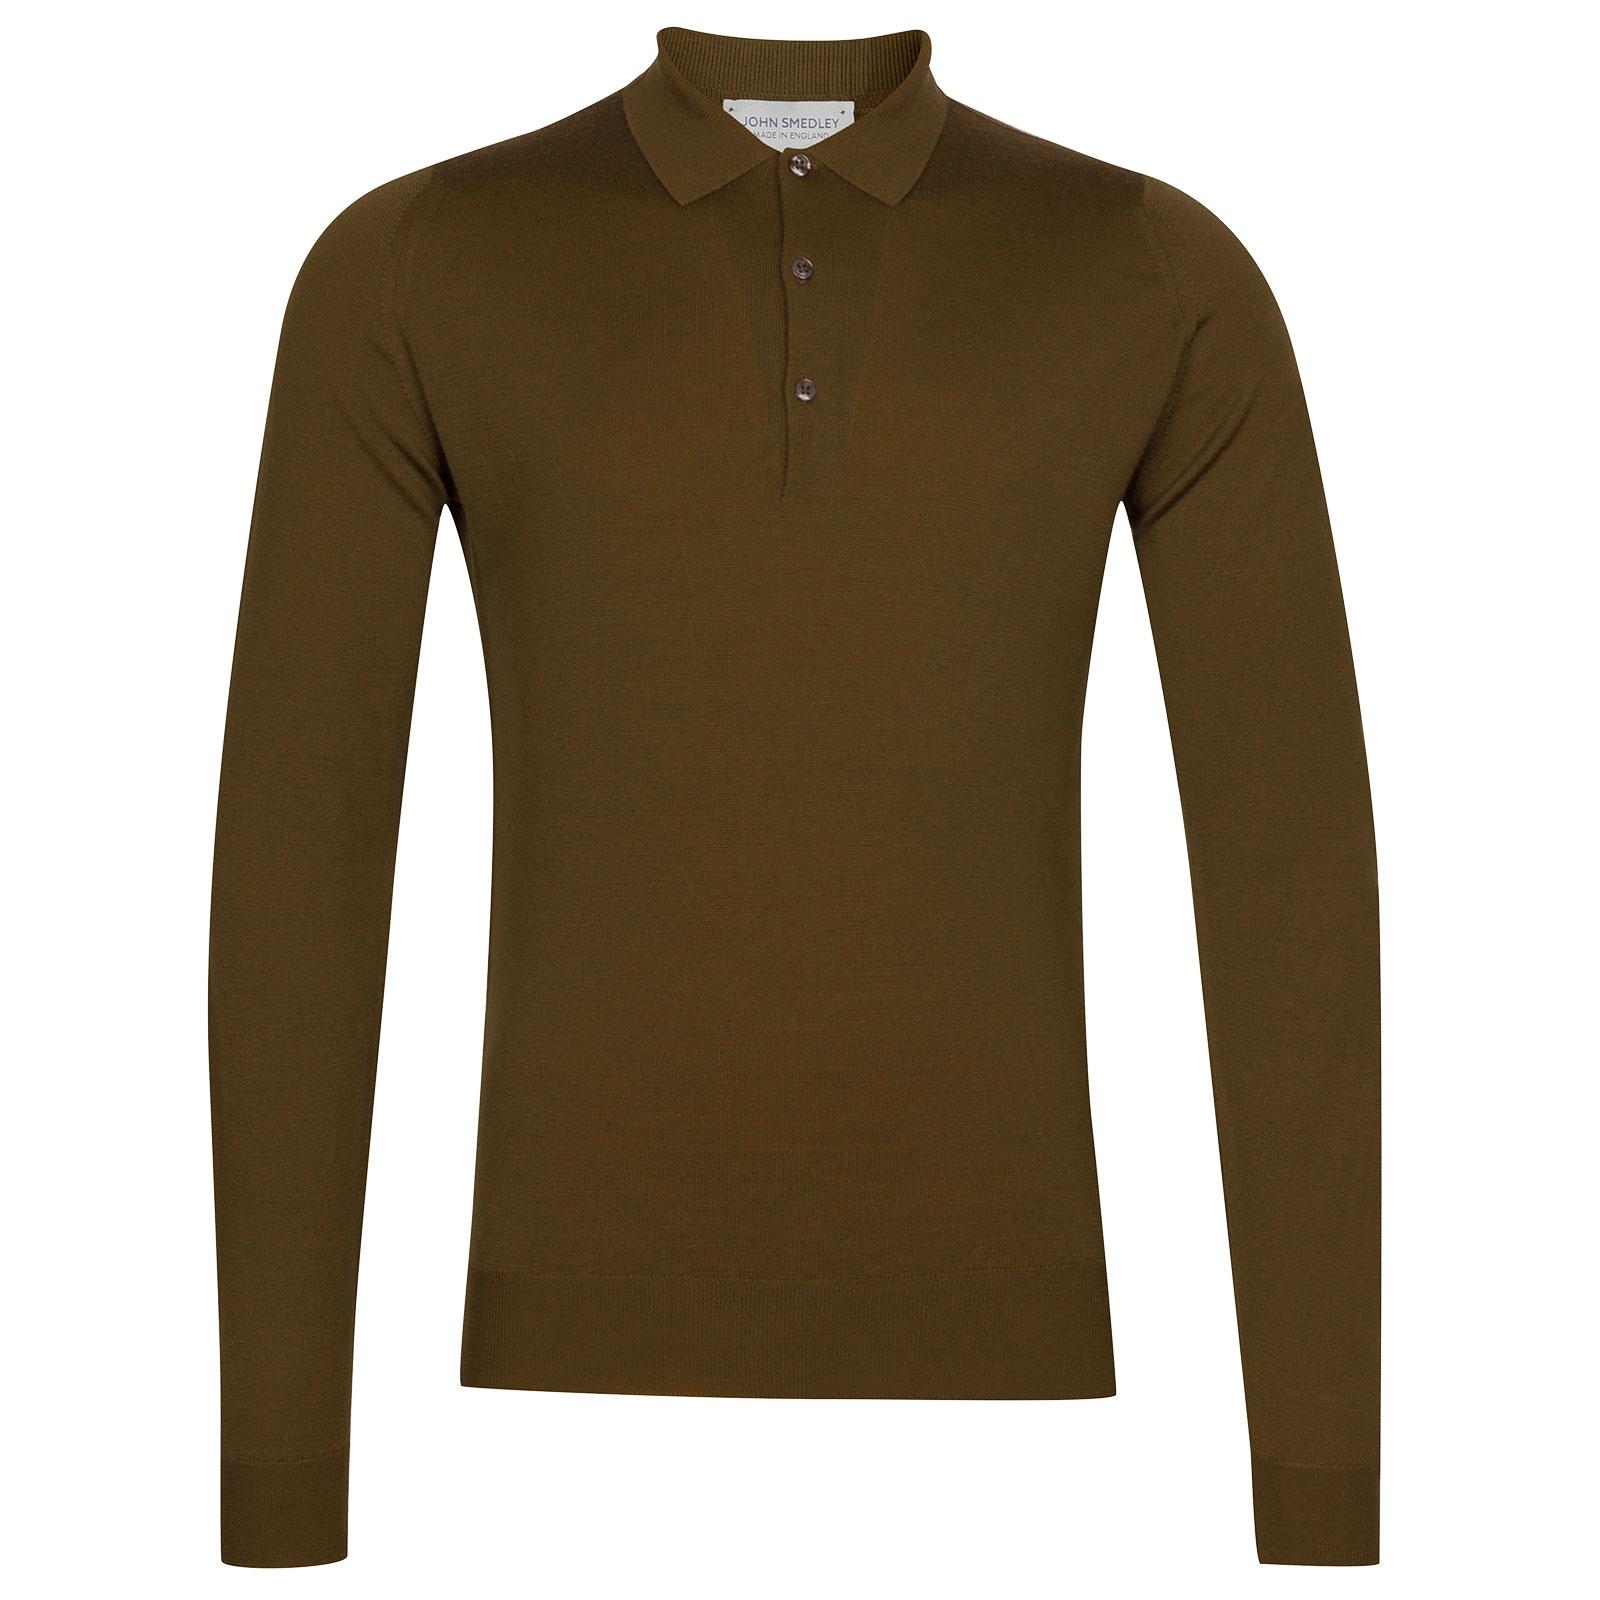 John Smedley Belper Merino Wool Shirt in Khaki-S